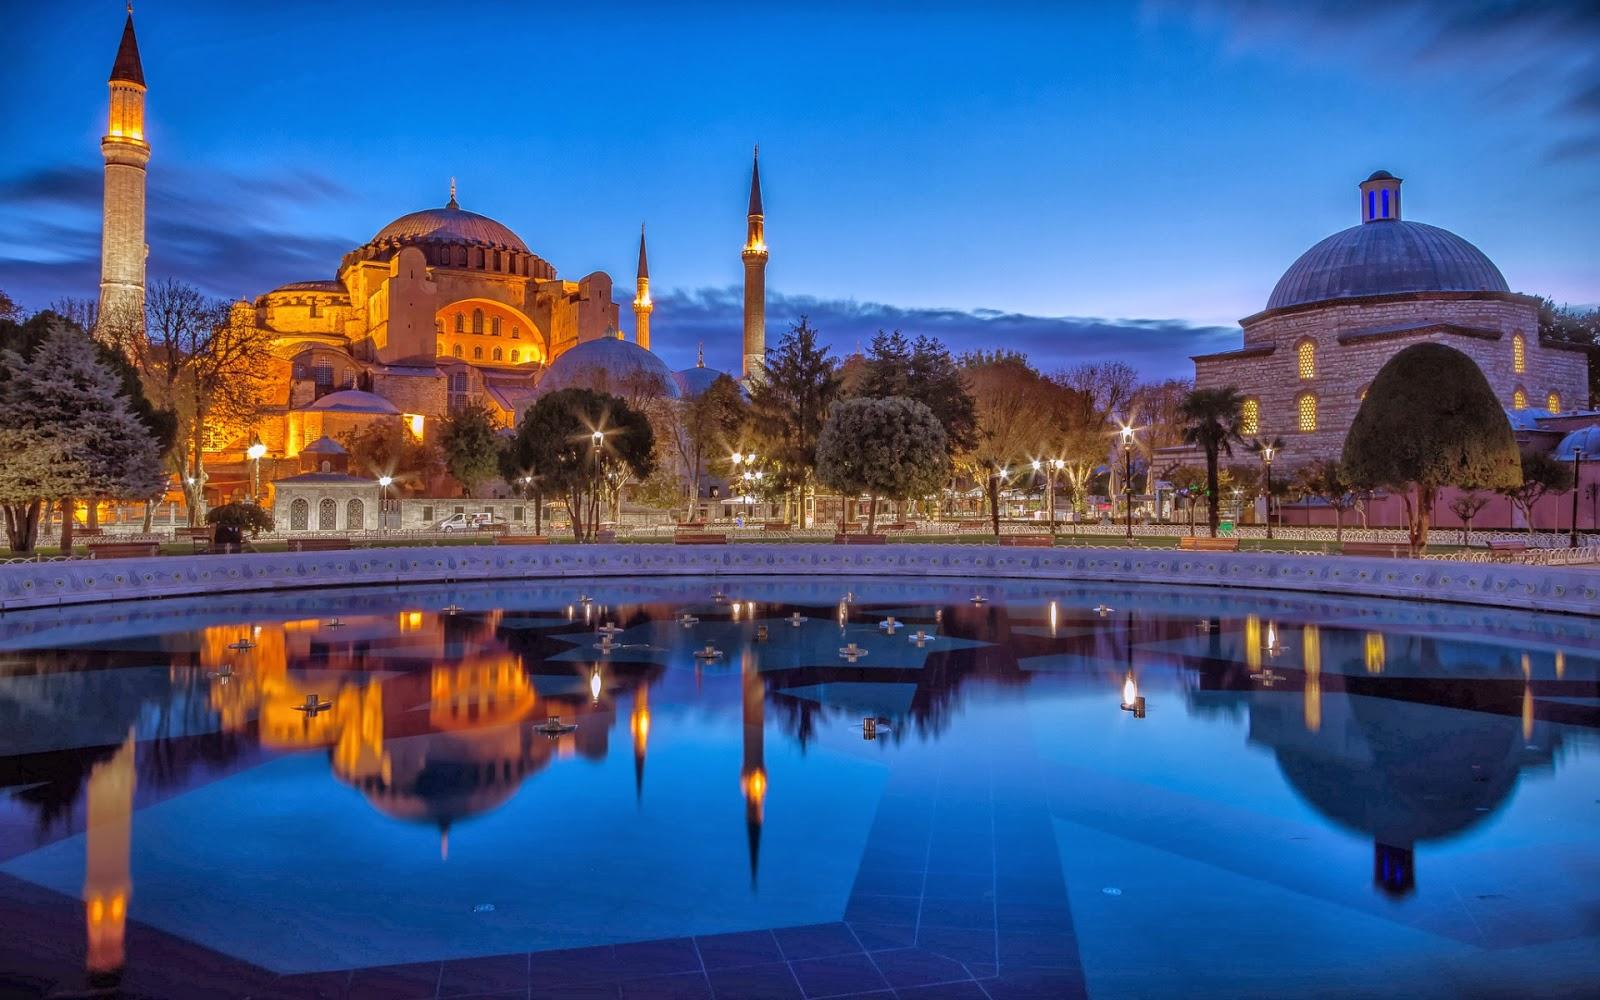 wallpaper islamic informatin site: top rated wallpapers hd for desktop 2014